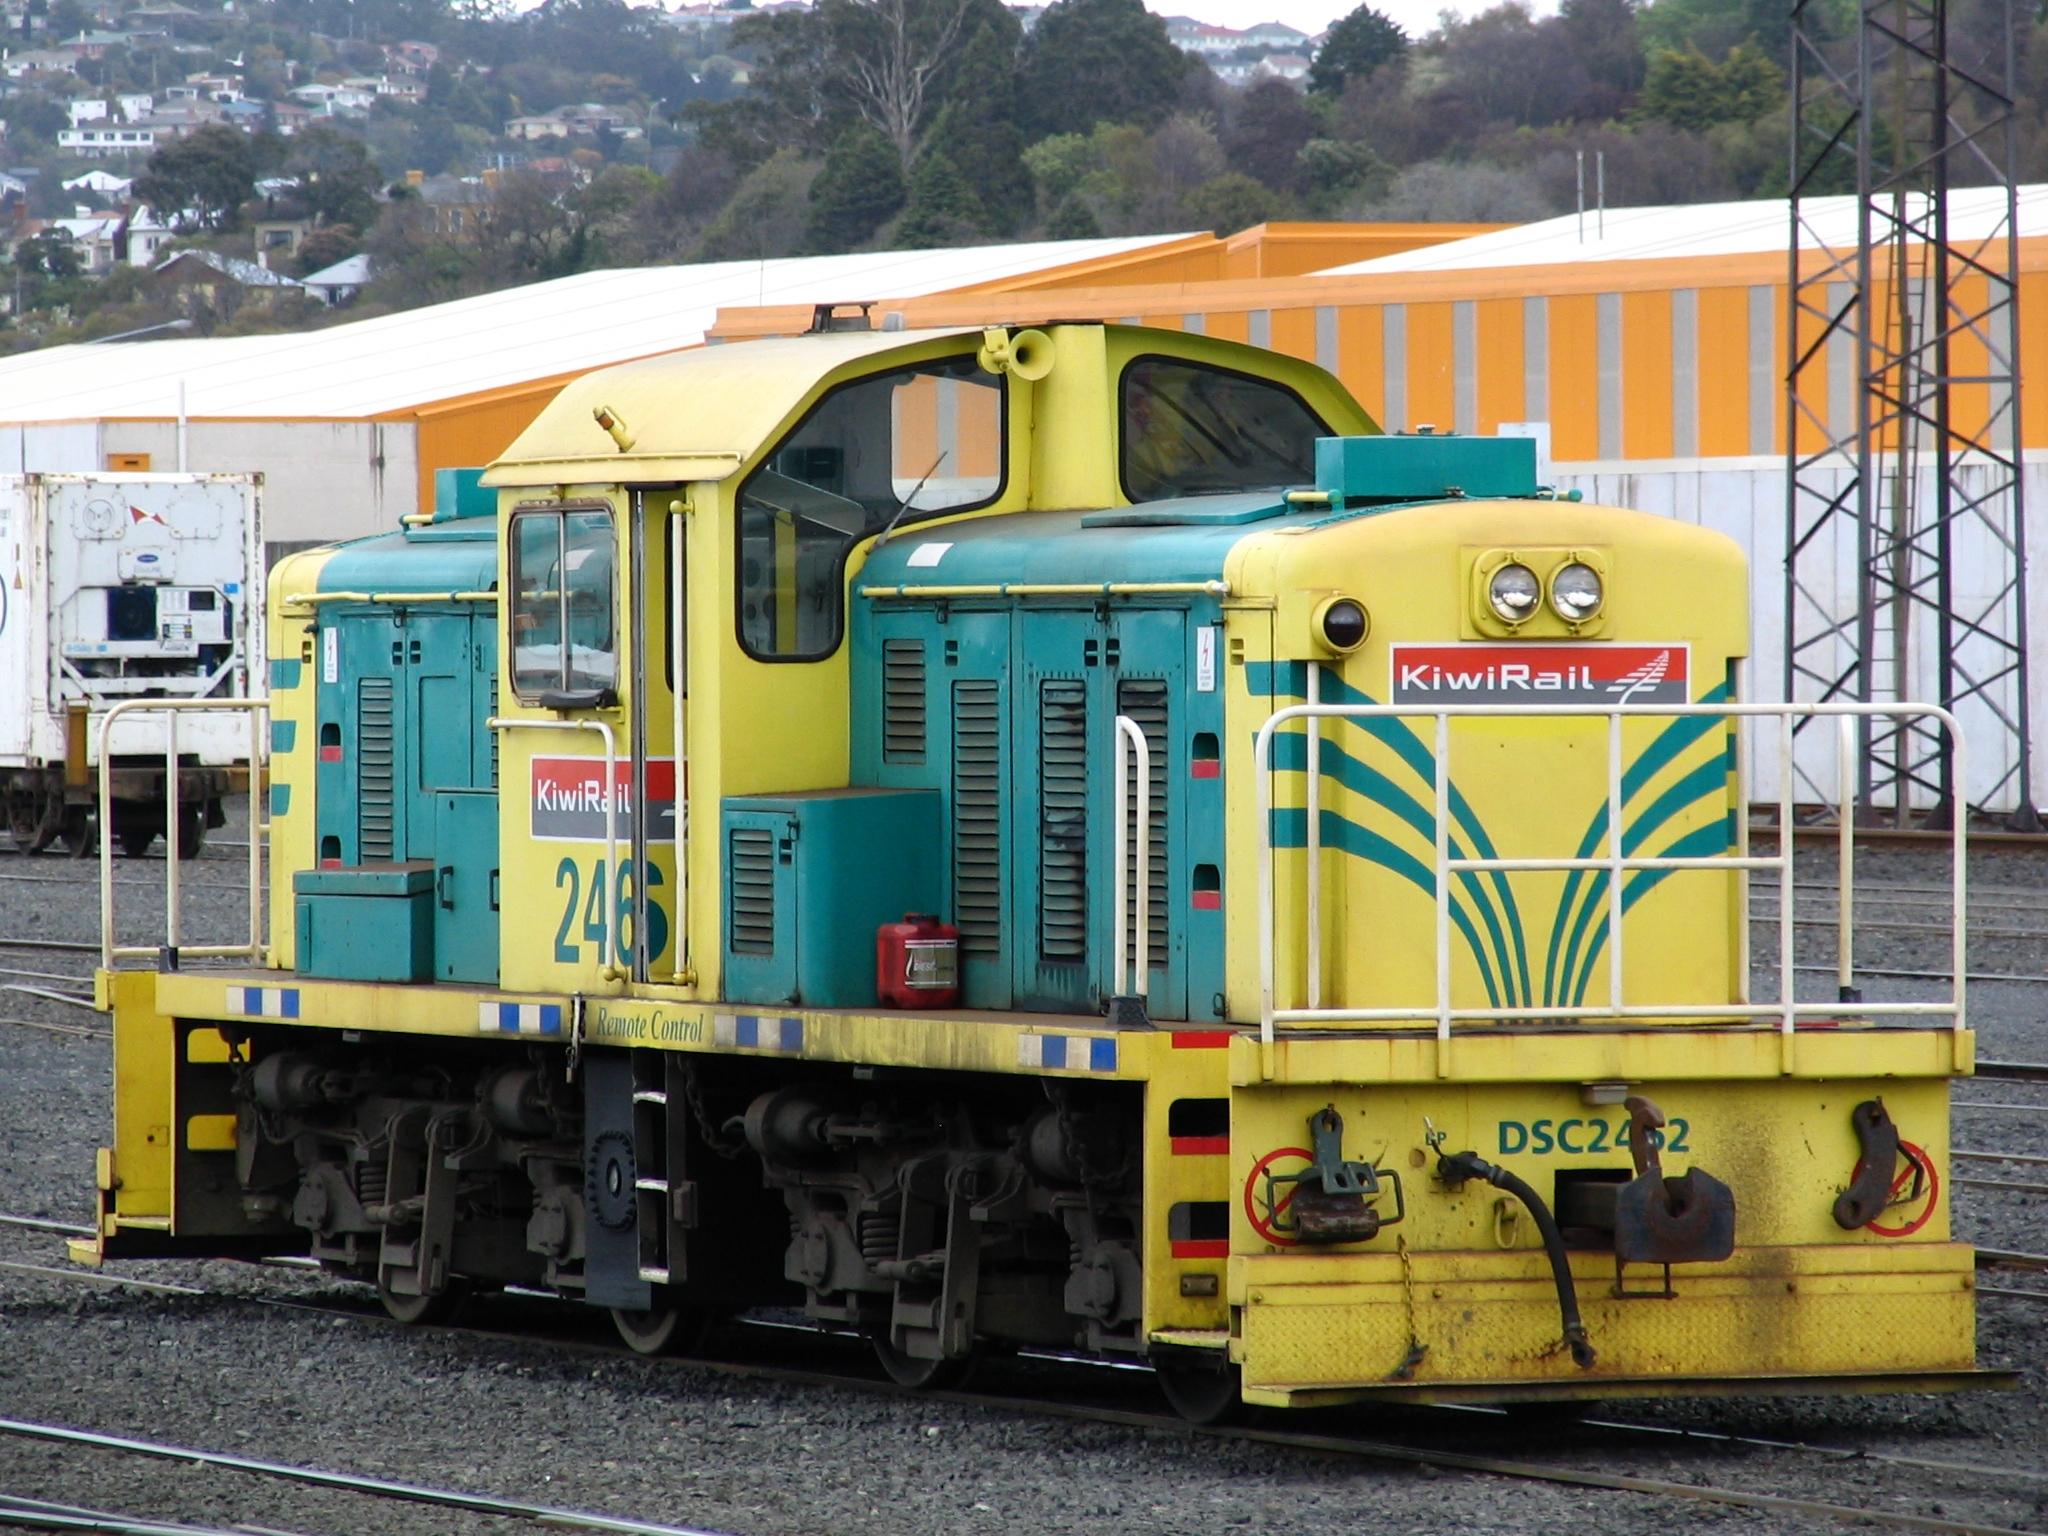 File:NZR DSC 2462, Dunedin, NZ.JPG